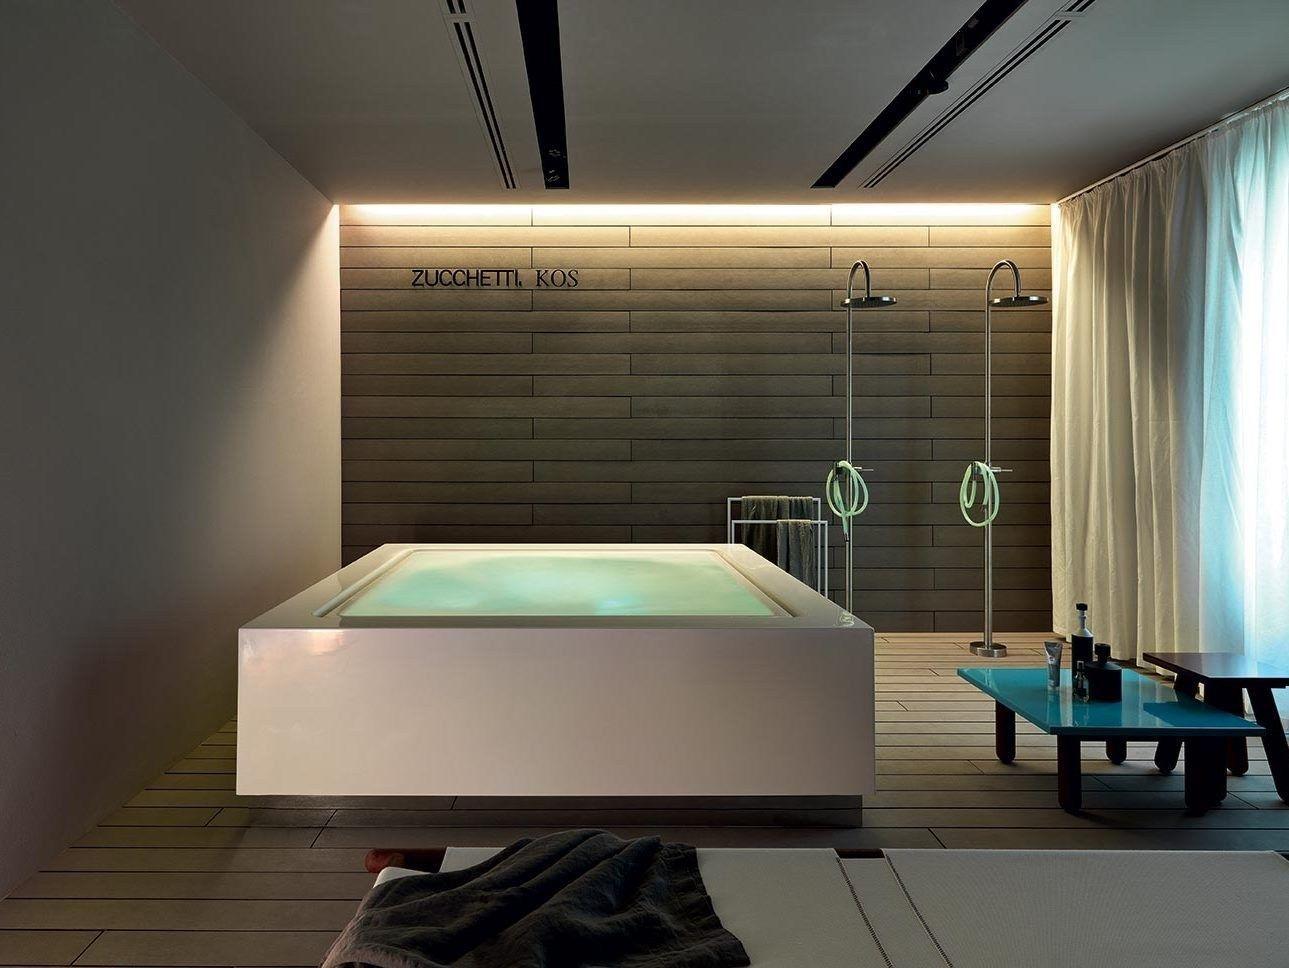 Pin By Sokianos Cc On Bathroom Hot Tub Outdoor Indoor Hot Tub Bathroom Design